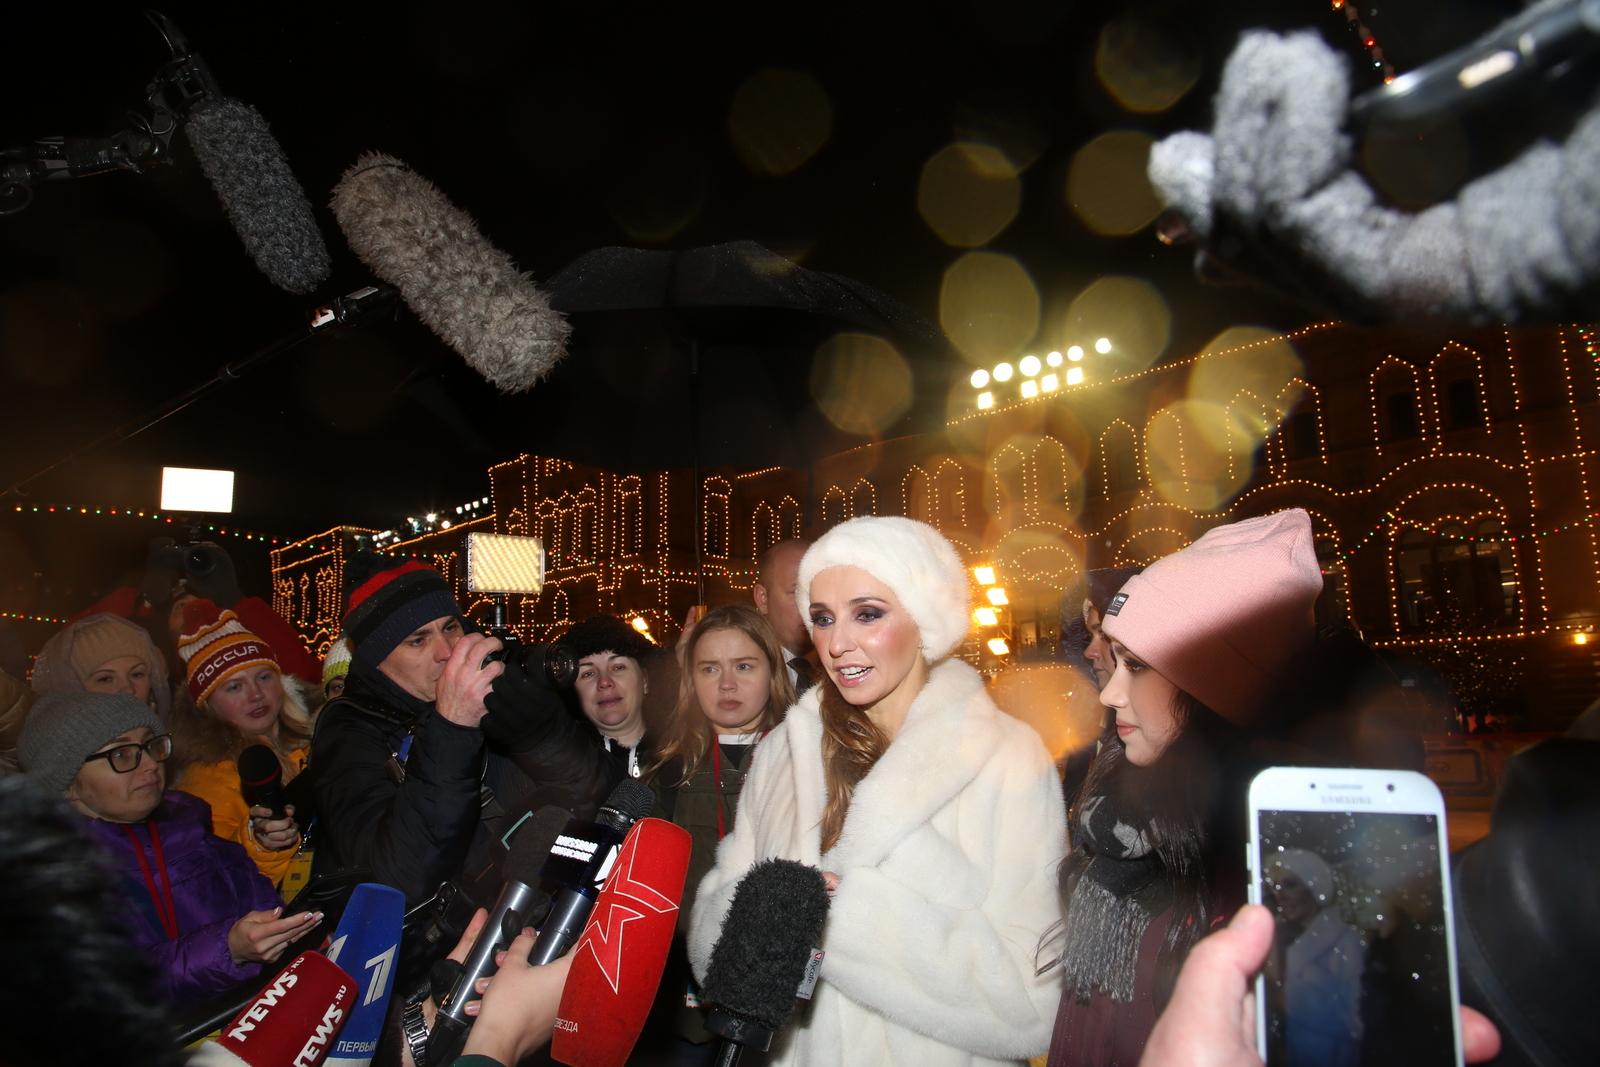 Ледовые шоу-2018-2019 - Страница 12 Kat-kudriavov-204044434